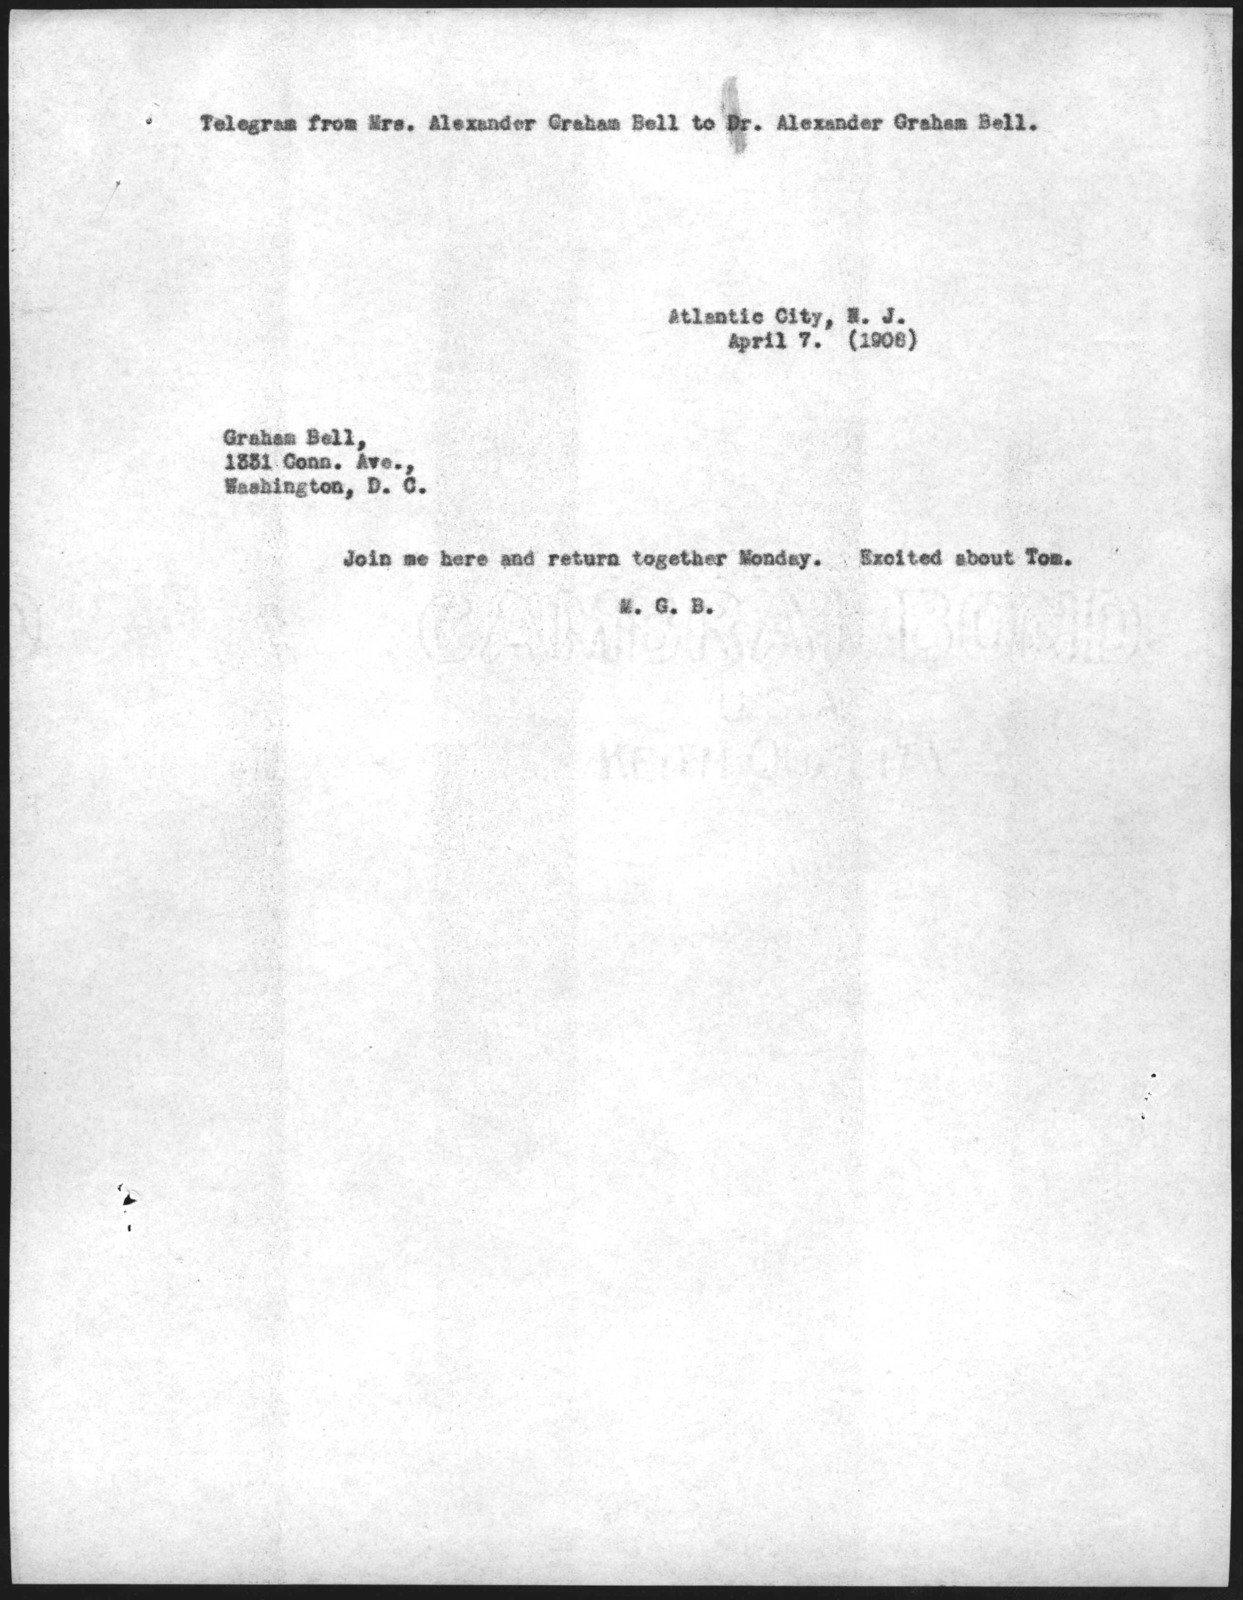 Telegram from Mabel Hubbard Bell to Alexander Graham Bell, April 7